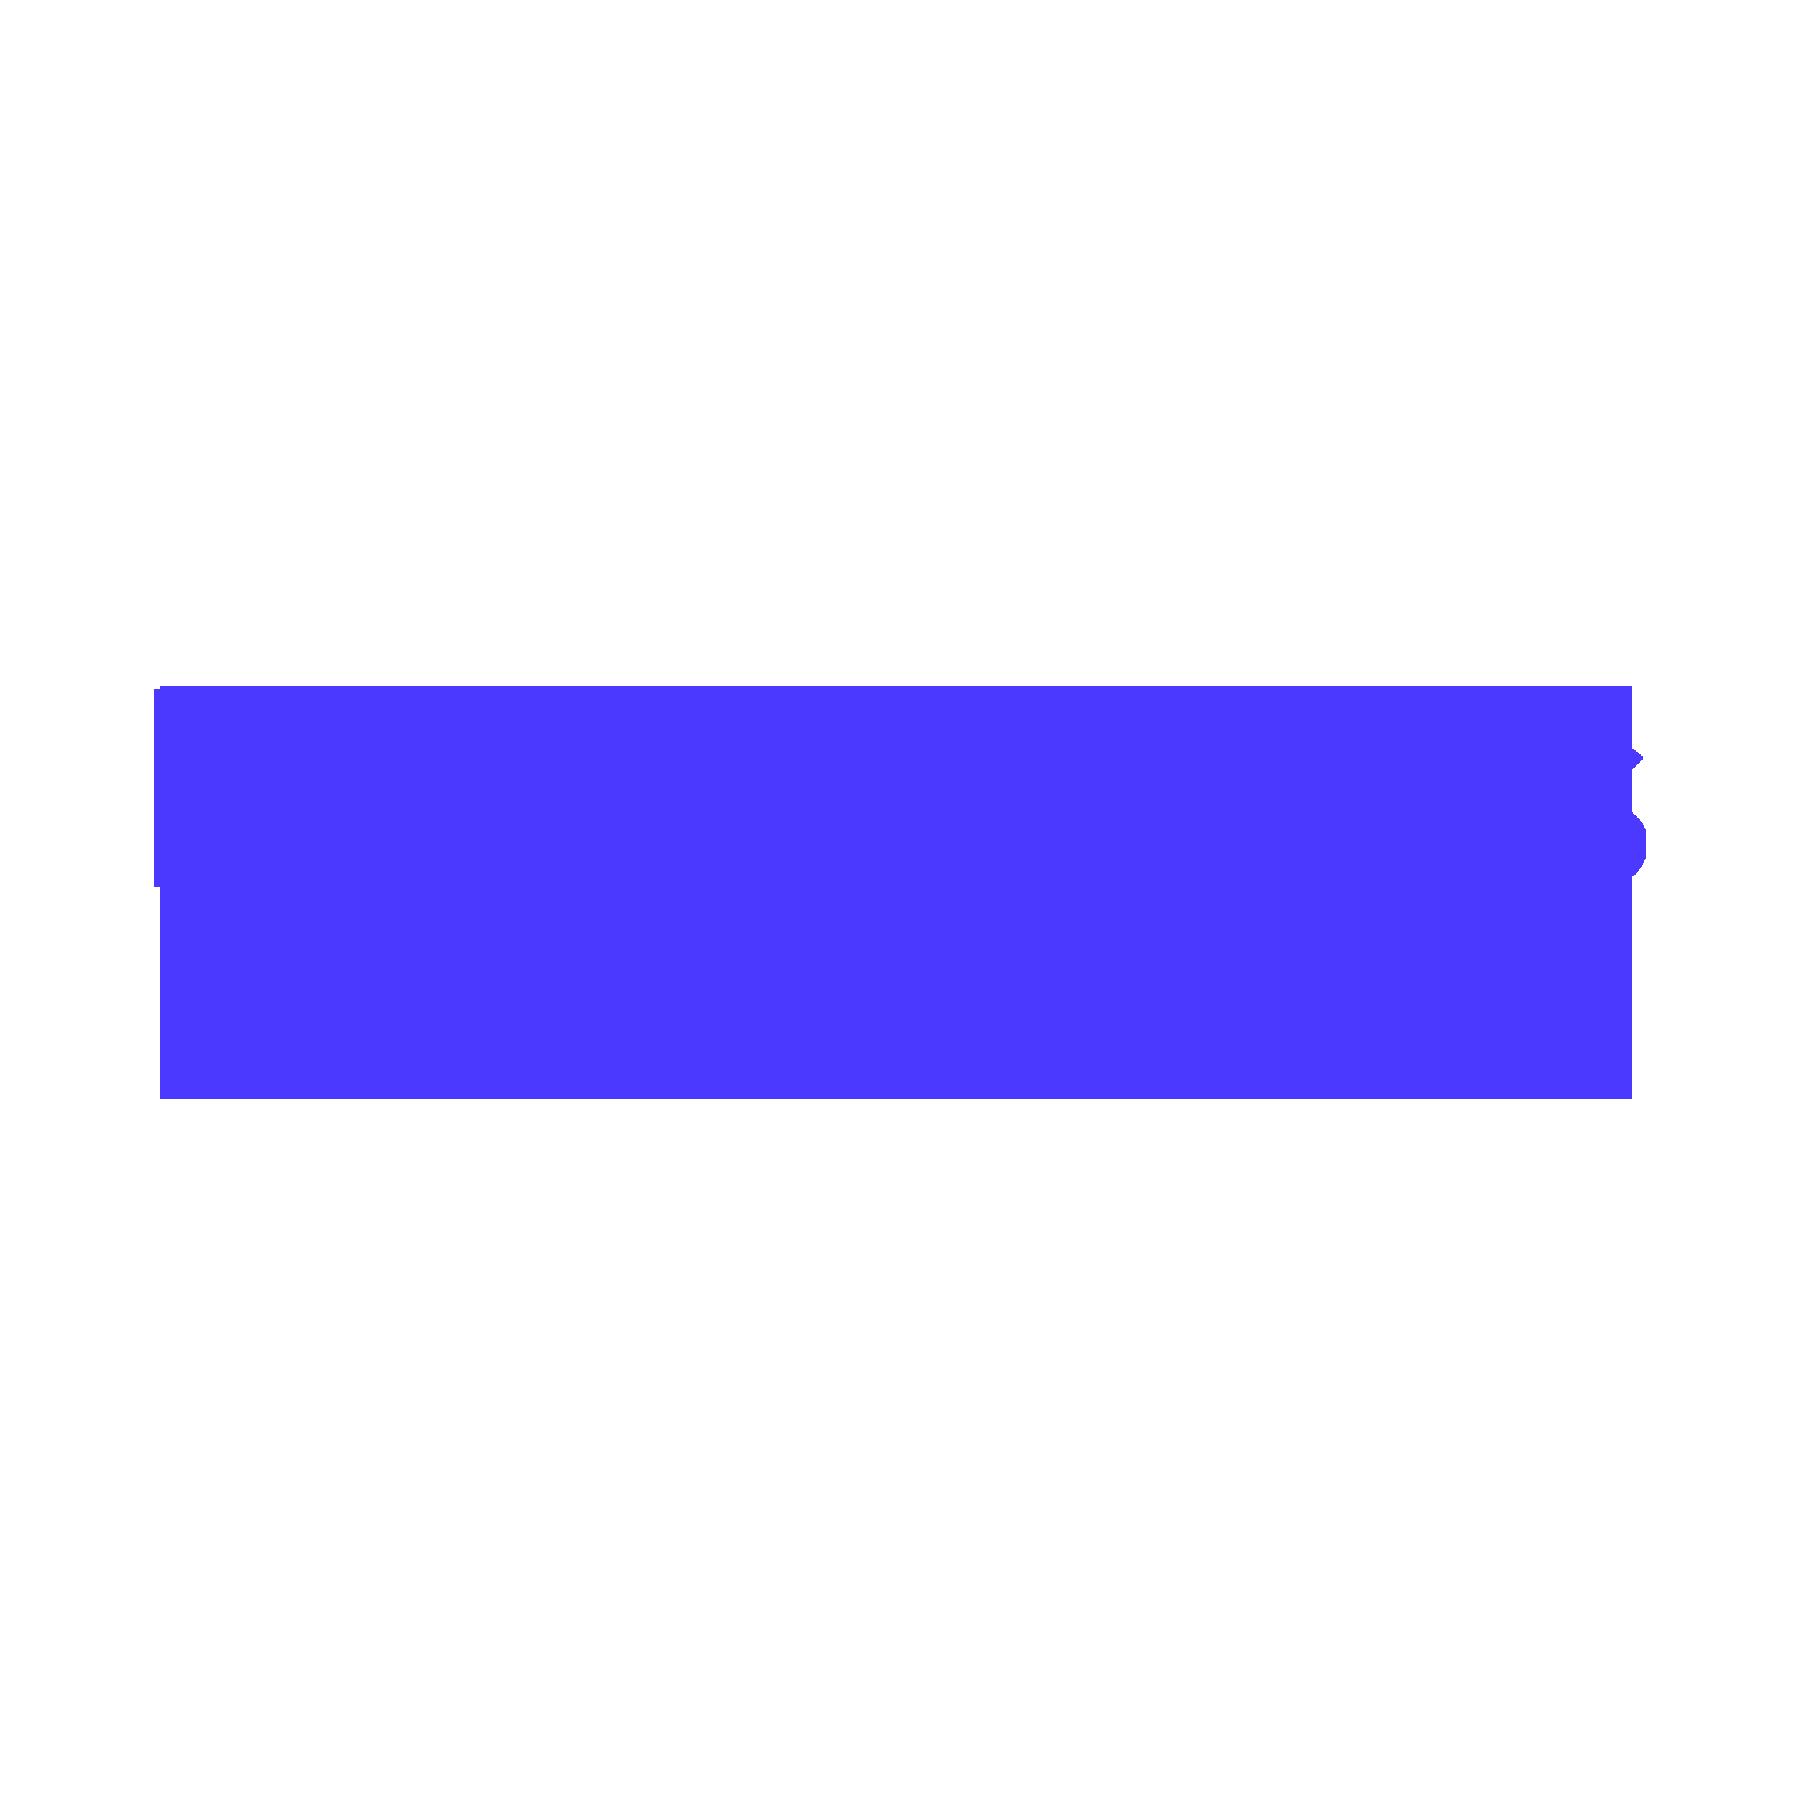 Ryan Owens